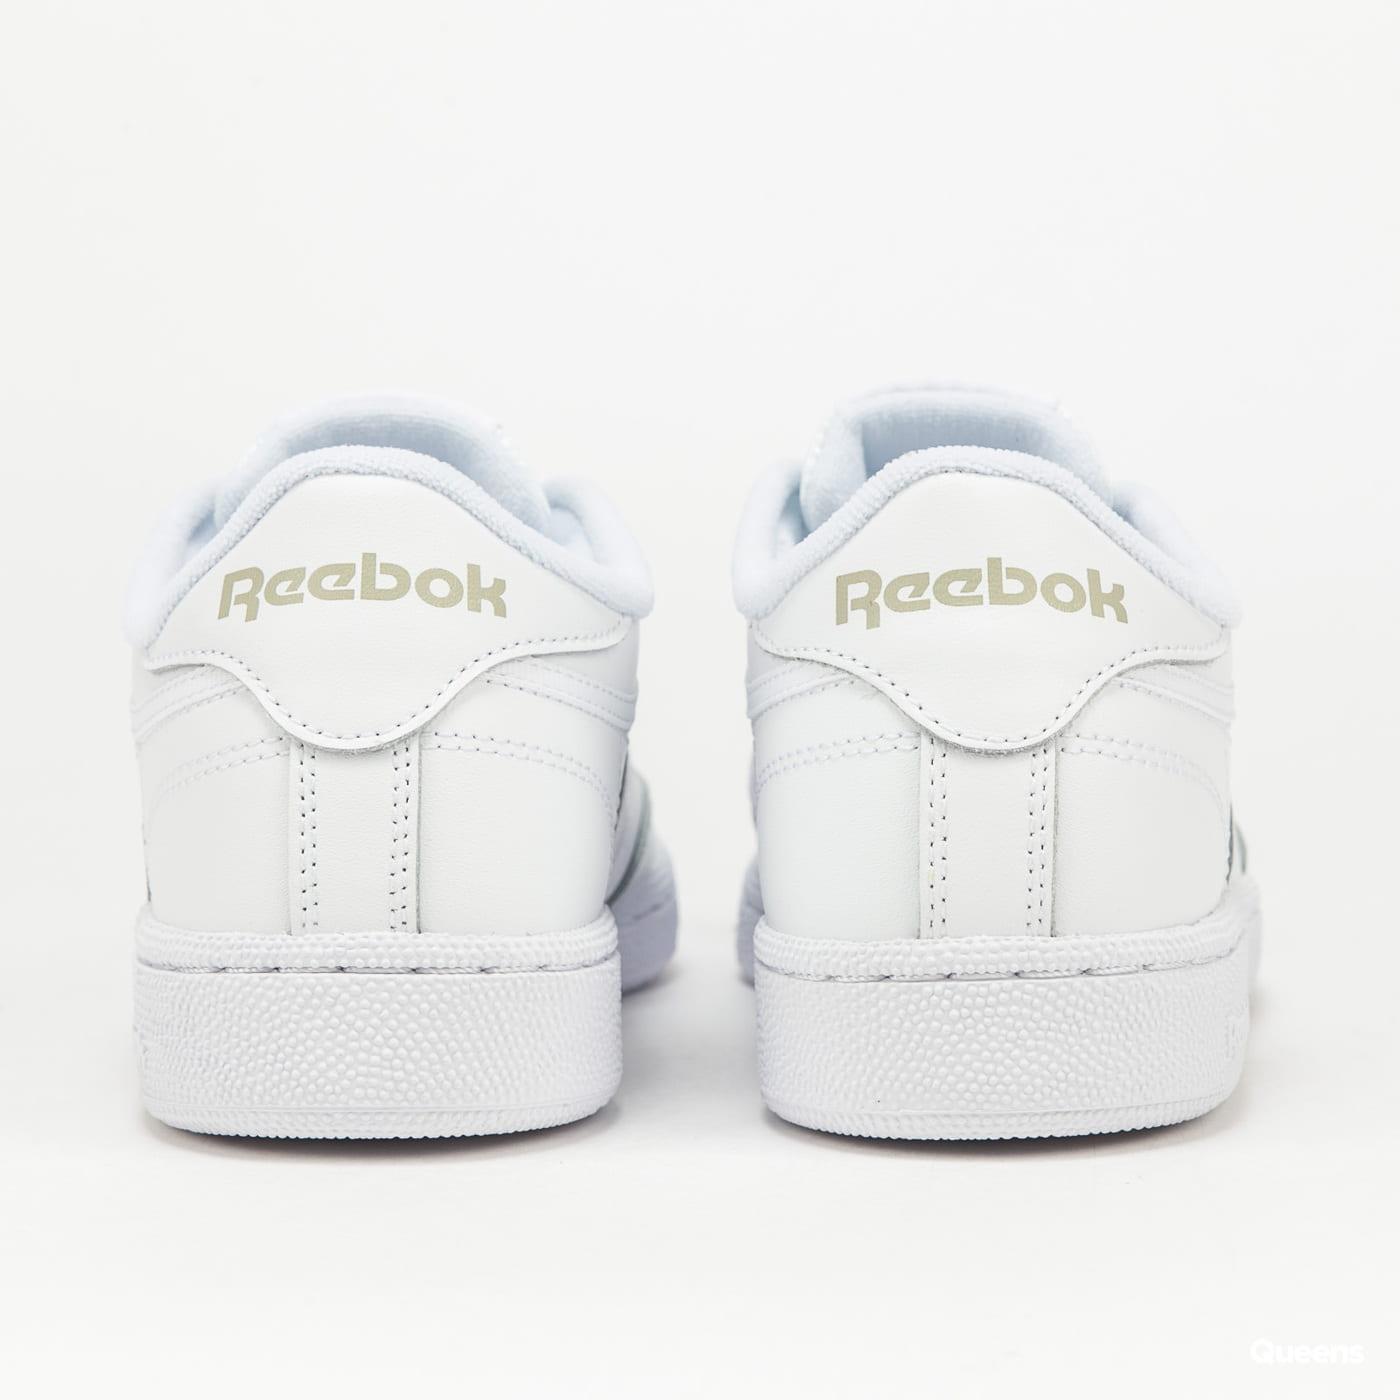 Reebok Club C 85 white / light grey